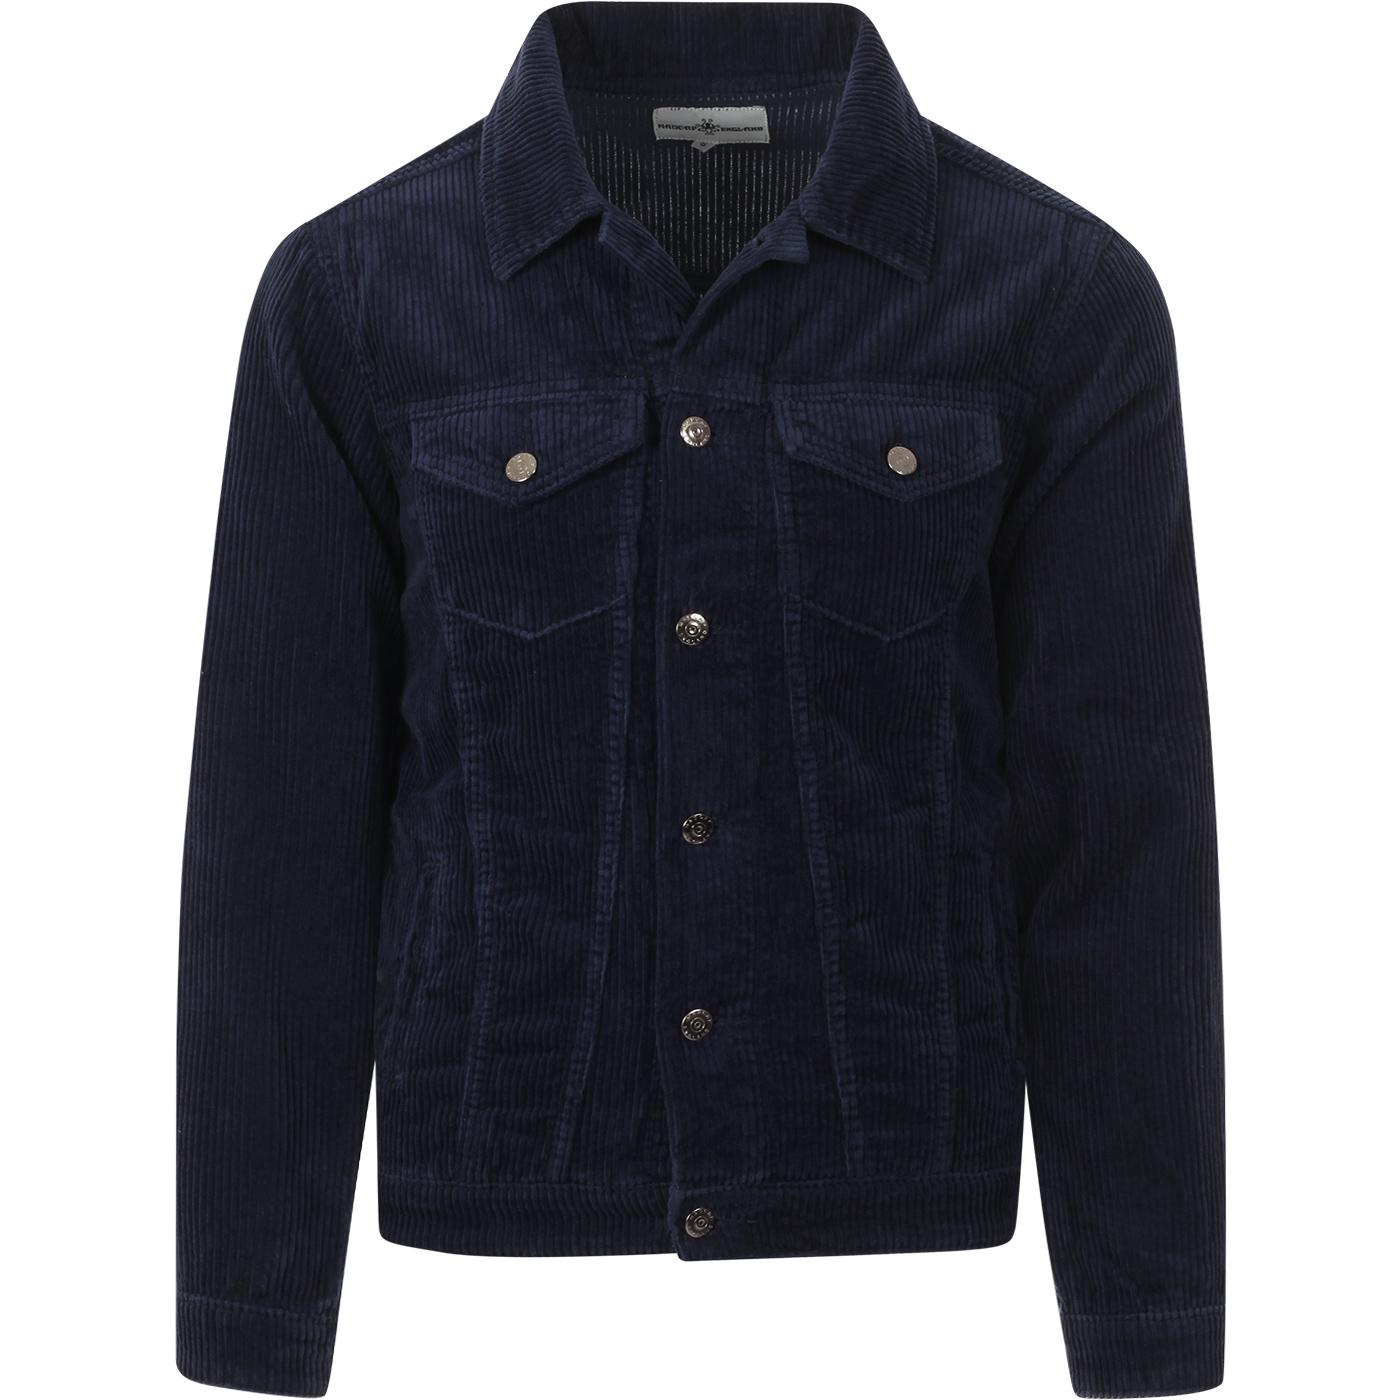 Woburn MADCAP ENGLAND Jumbo Cord Western Jacket N